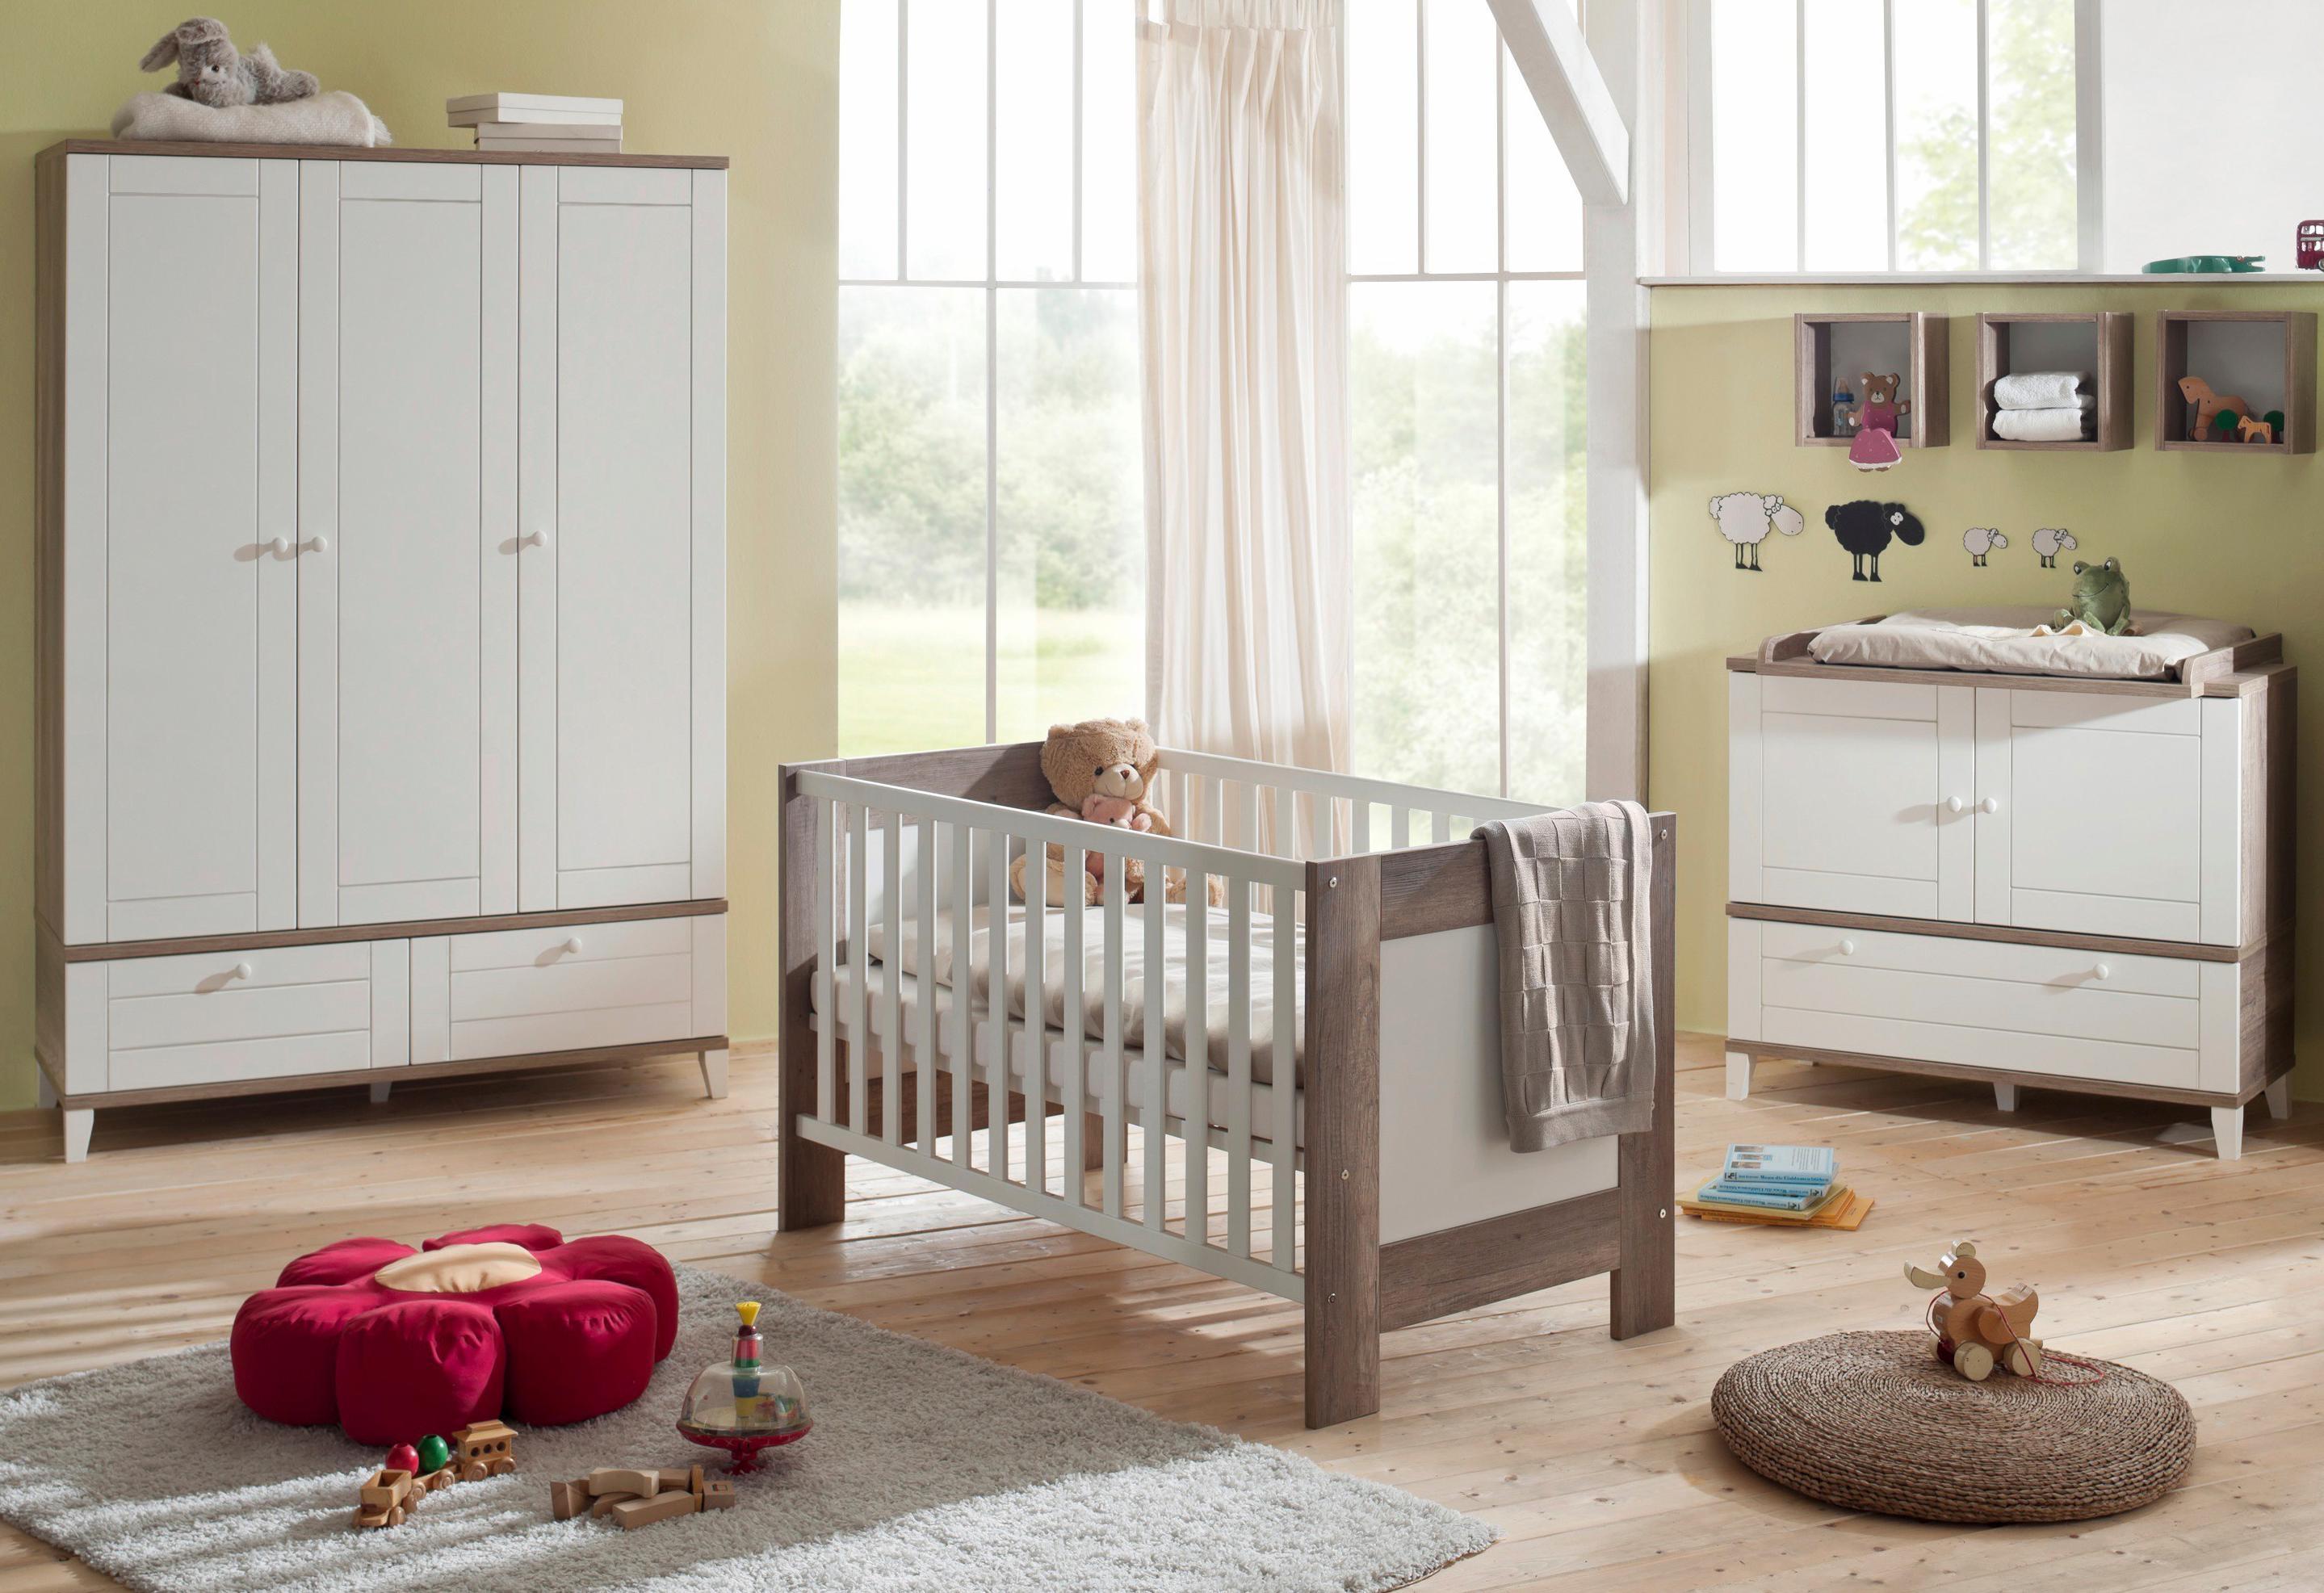 Hoogte Commode Babykamer : Kinderkamer »bella« in landhuisstijl: ledikantje commode